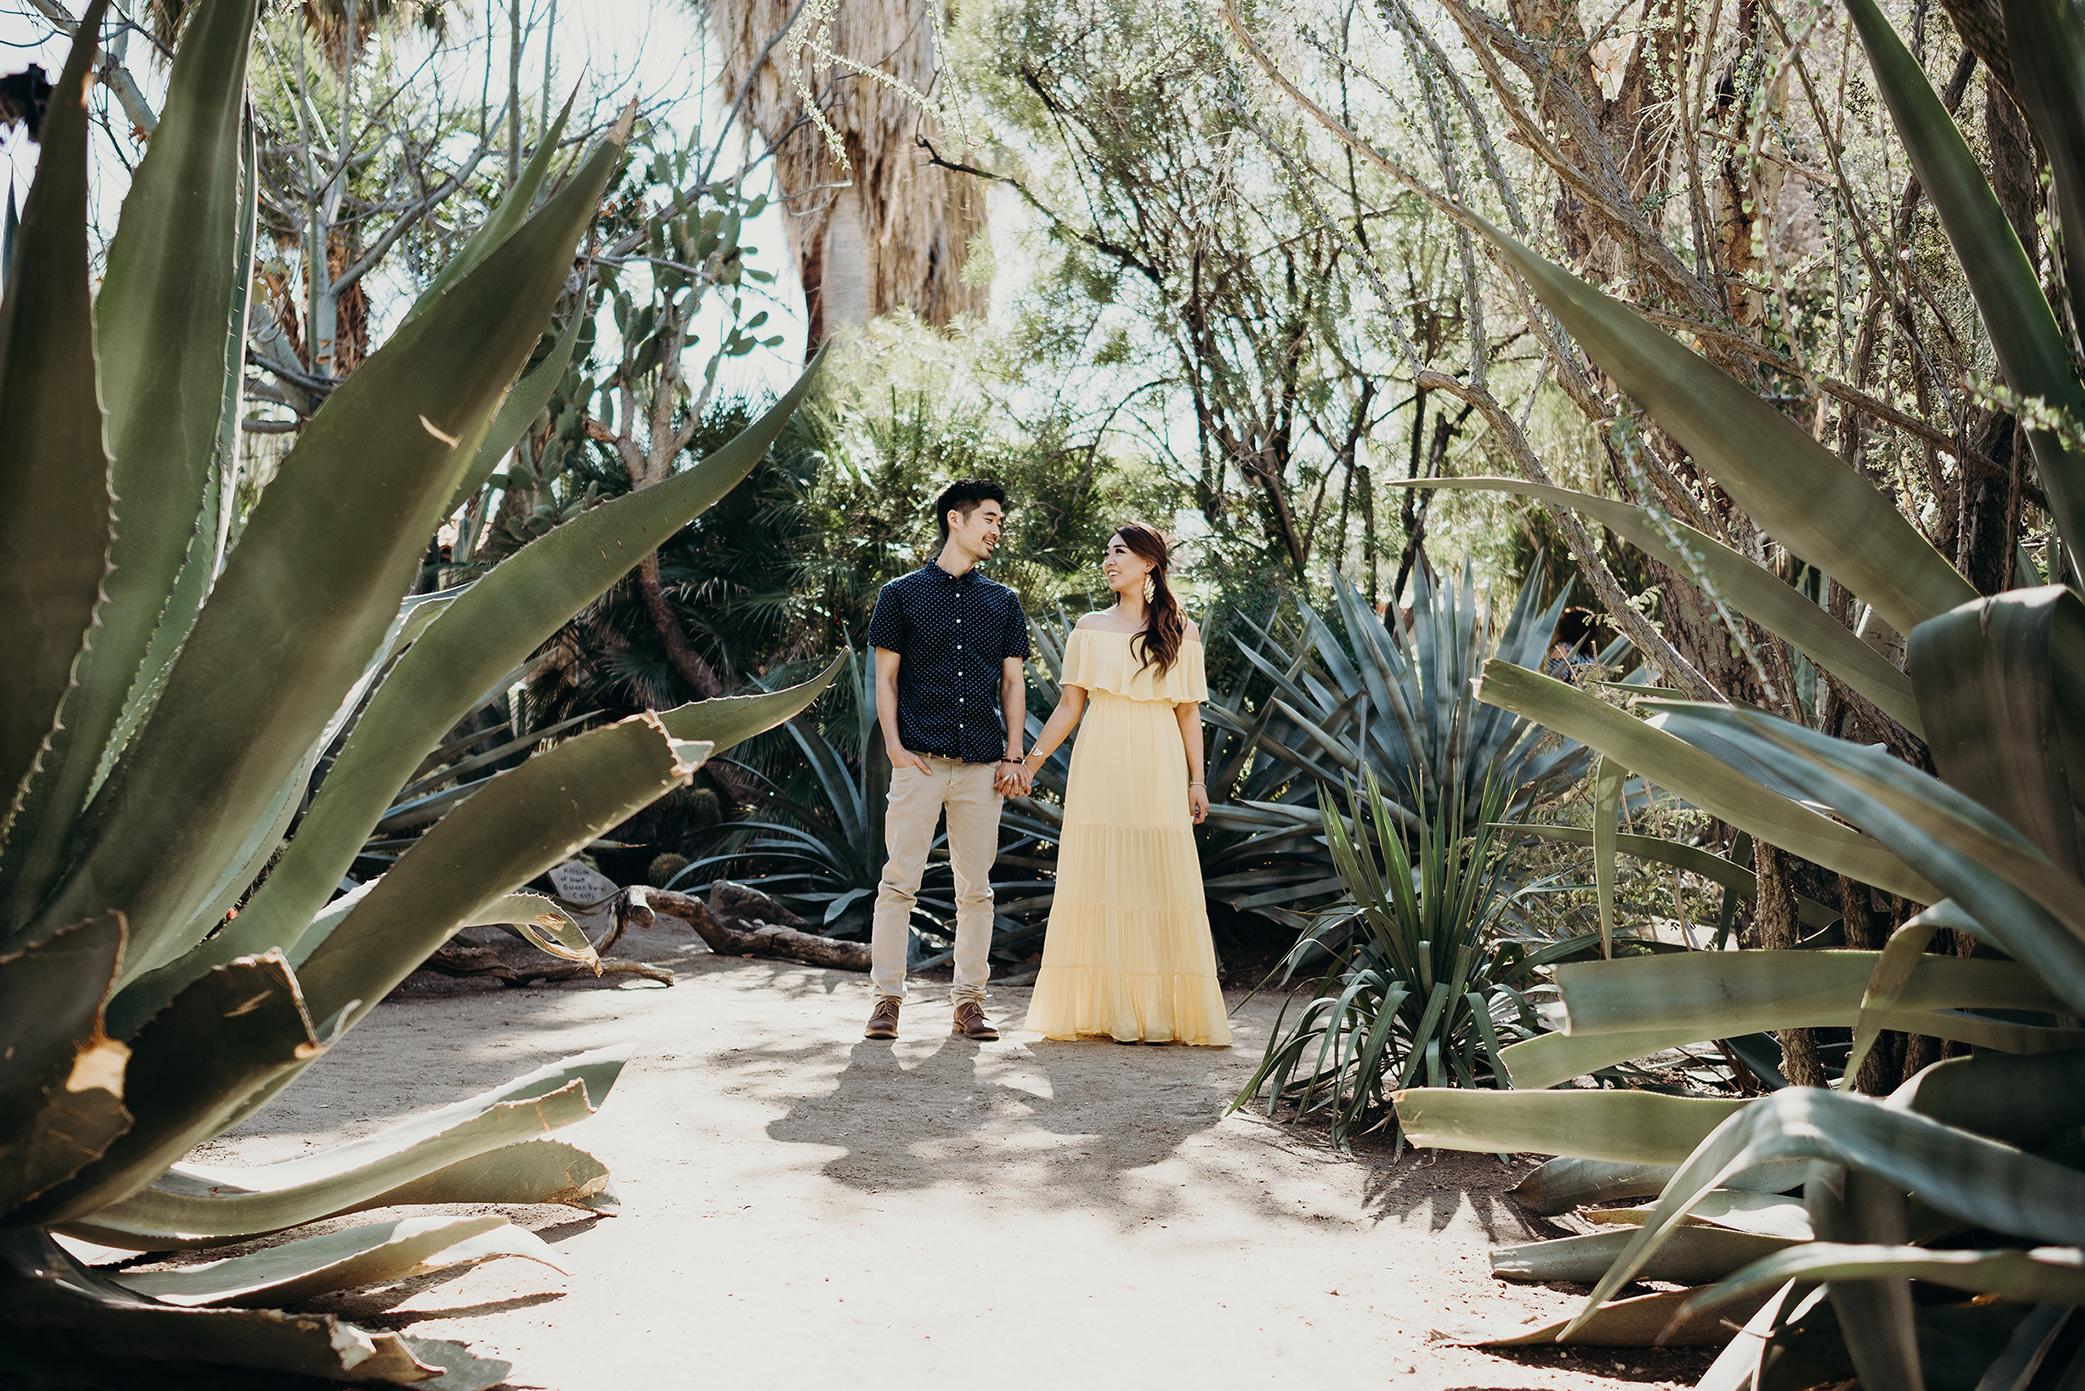 Alexis+Shawn Engagement Highlights - 1.jpg